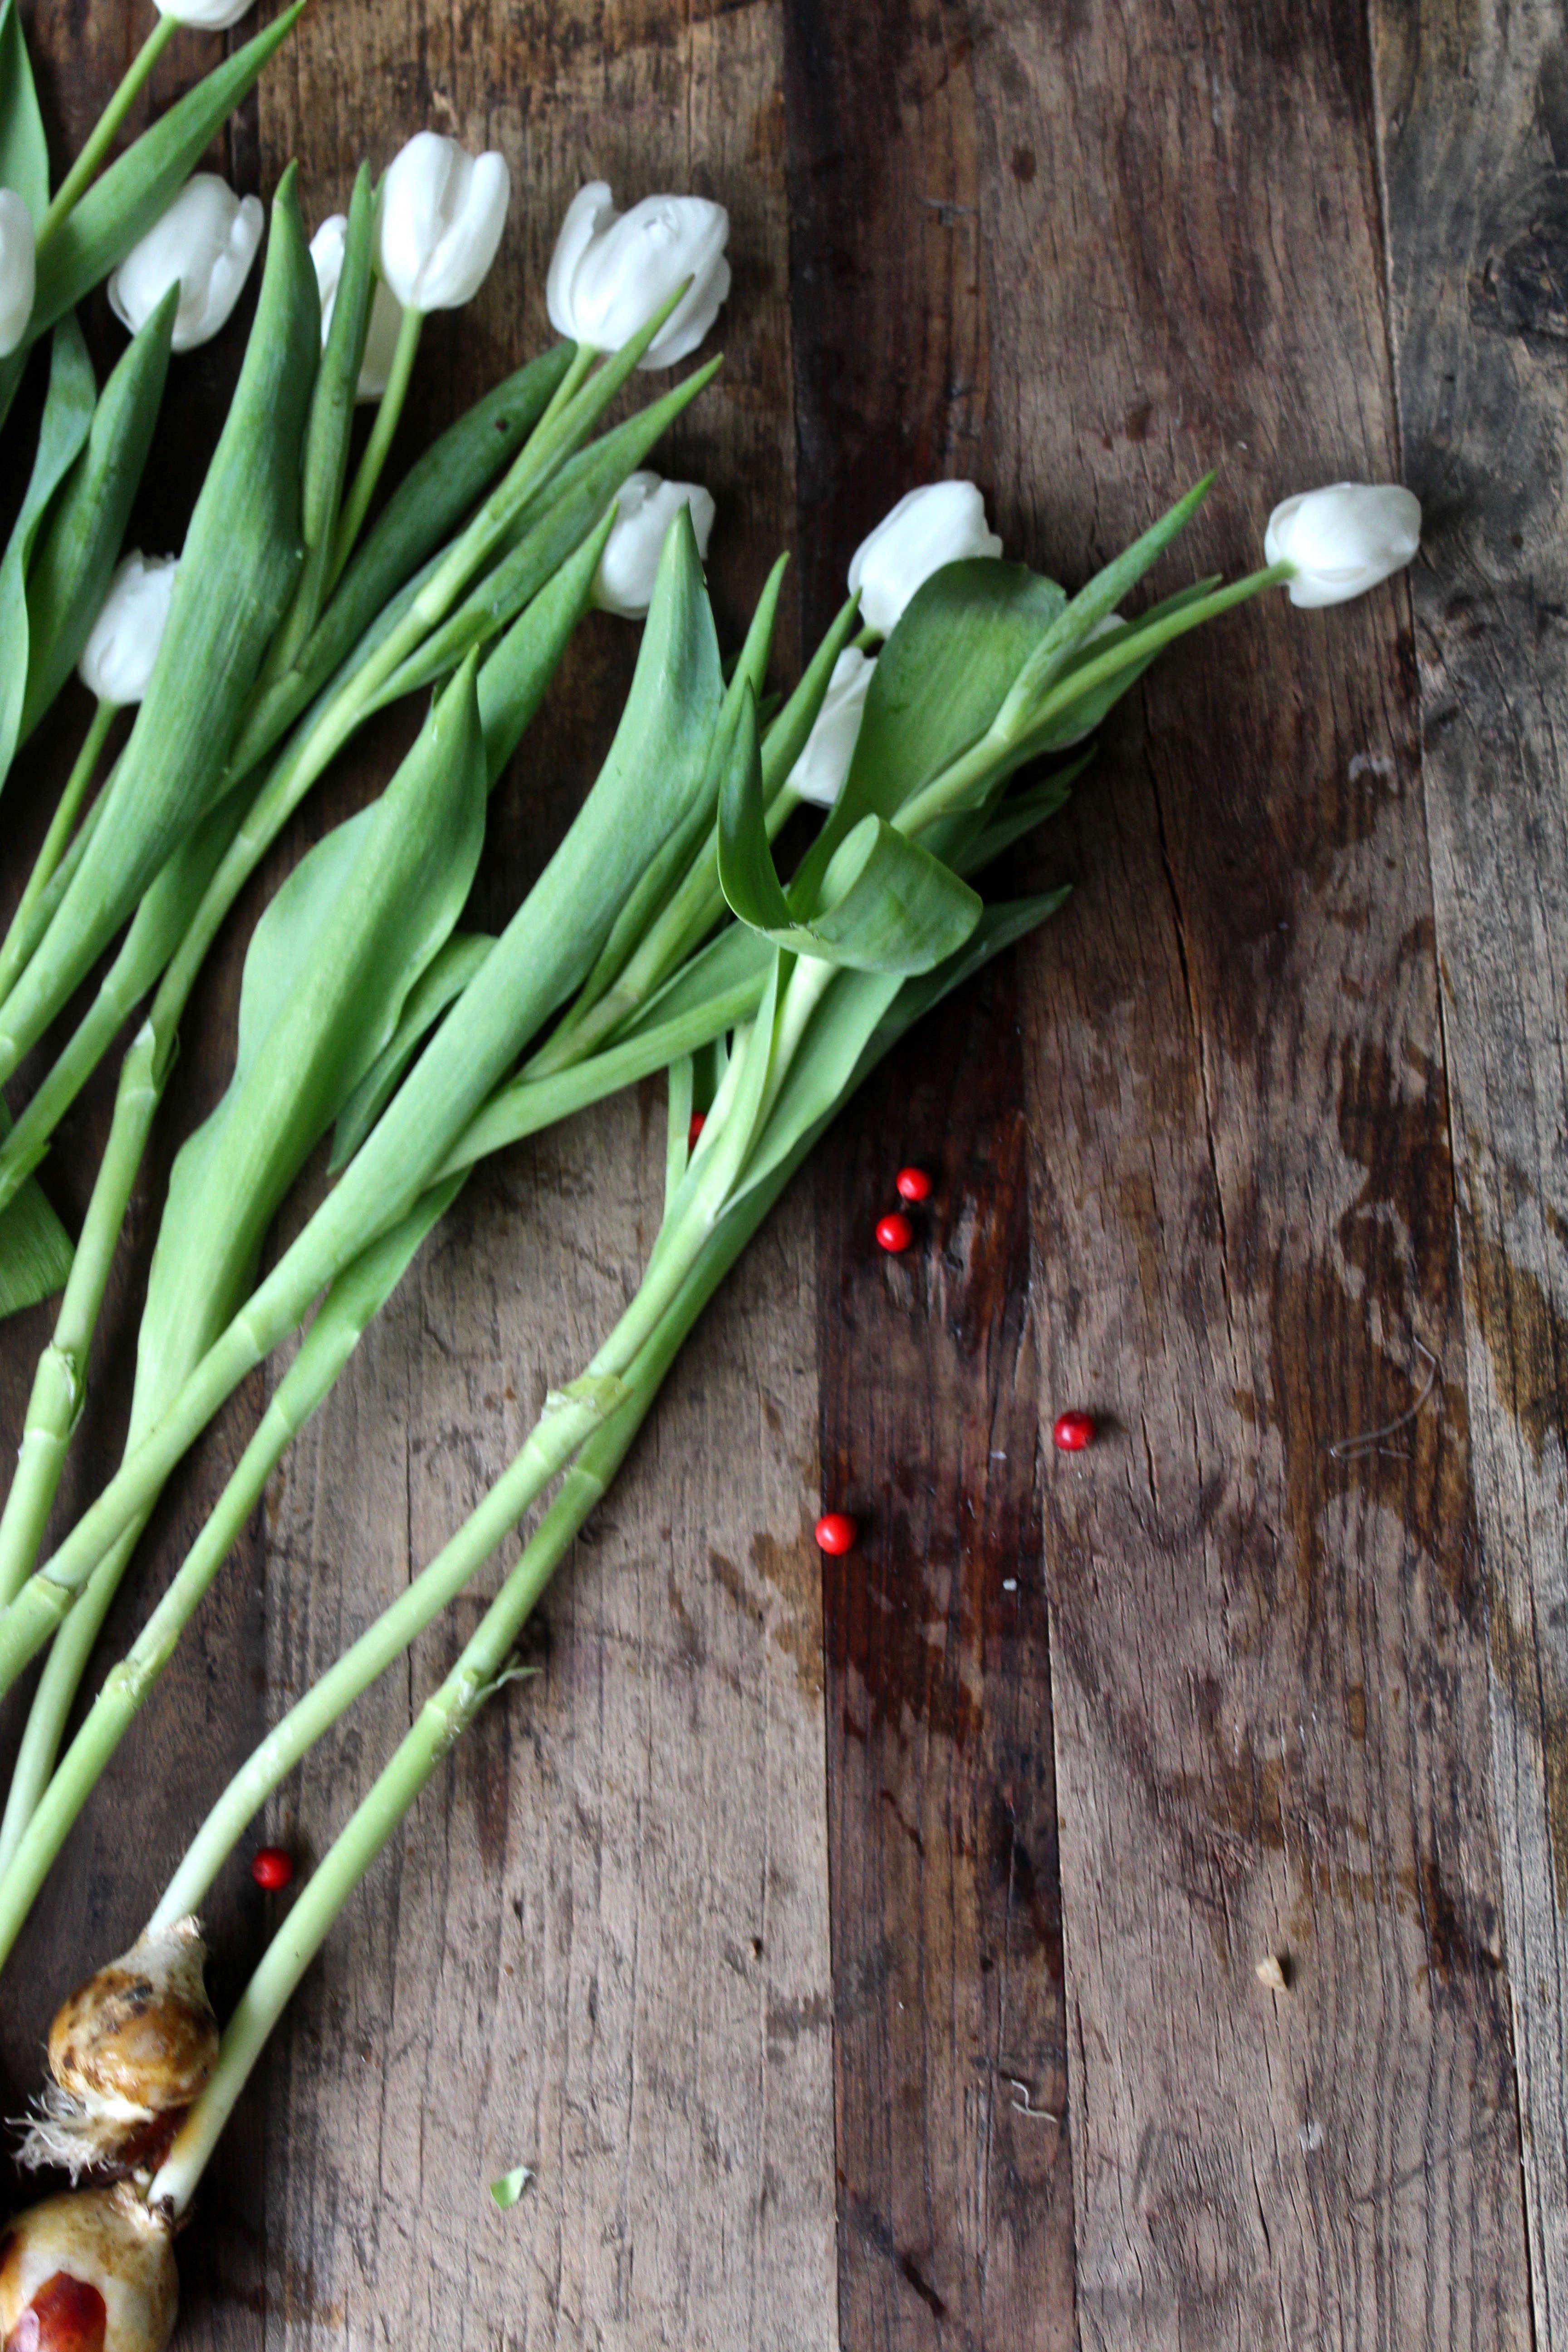 tulips-on-the-bulb-michelle-slatalla-img-3732